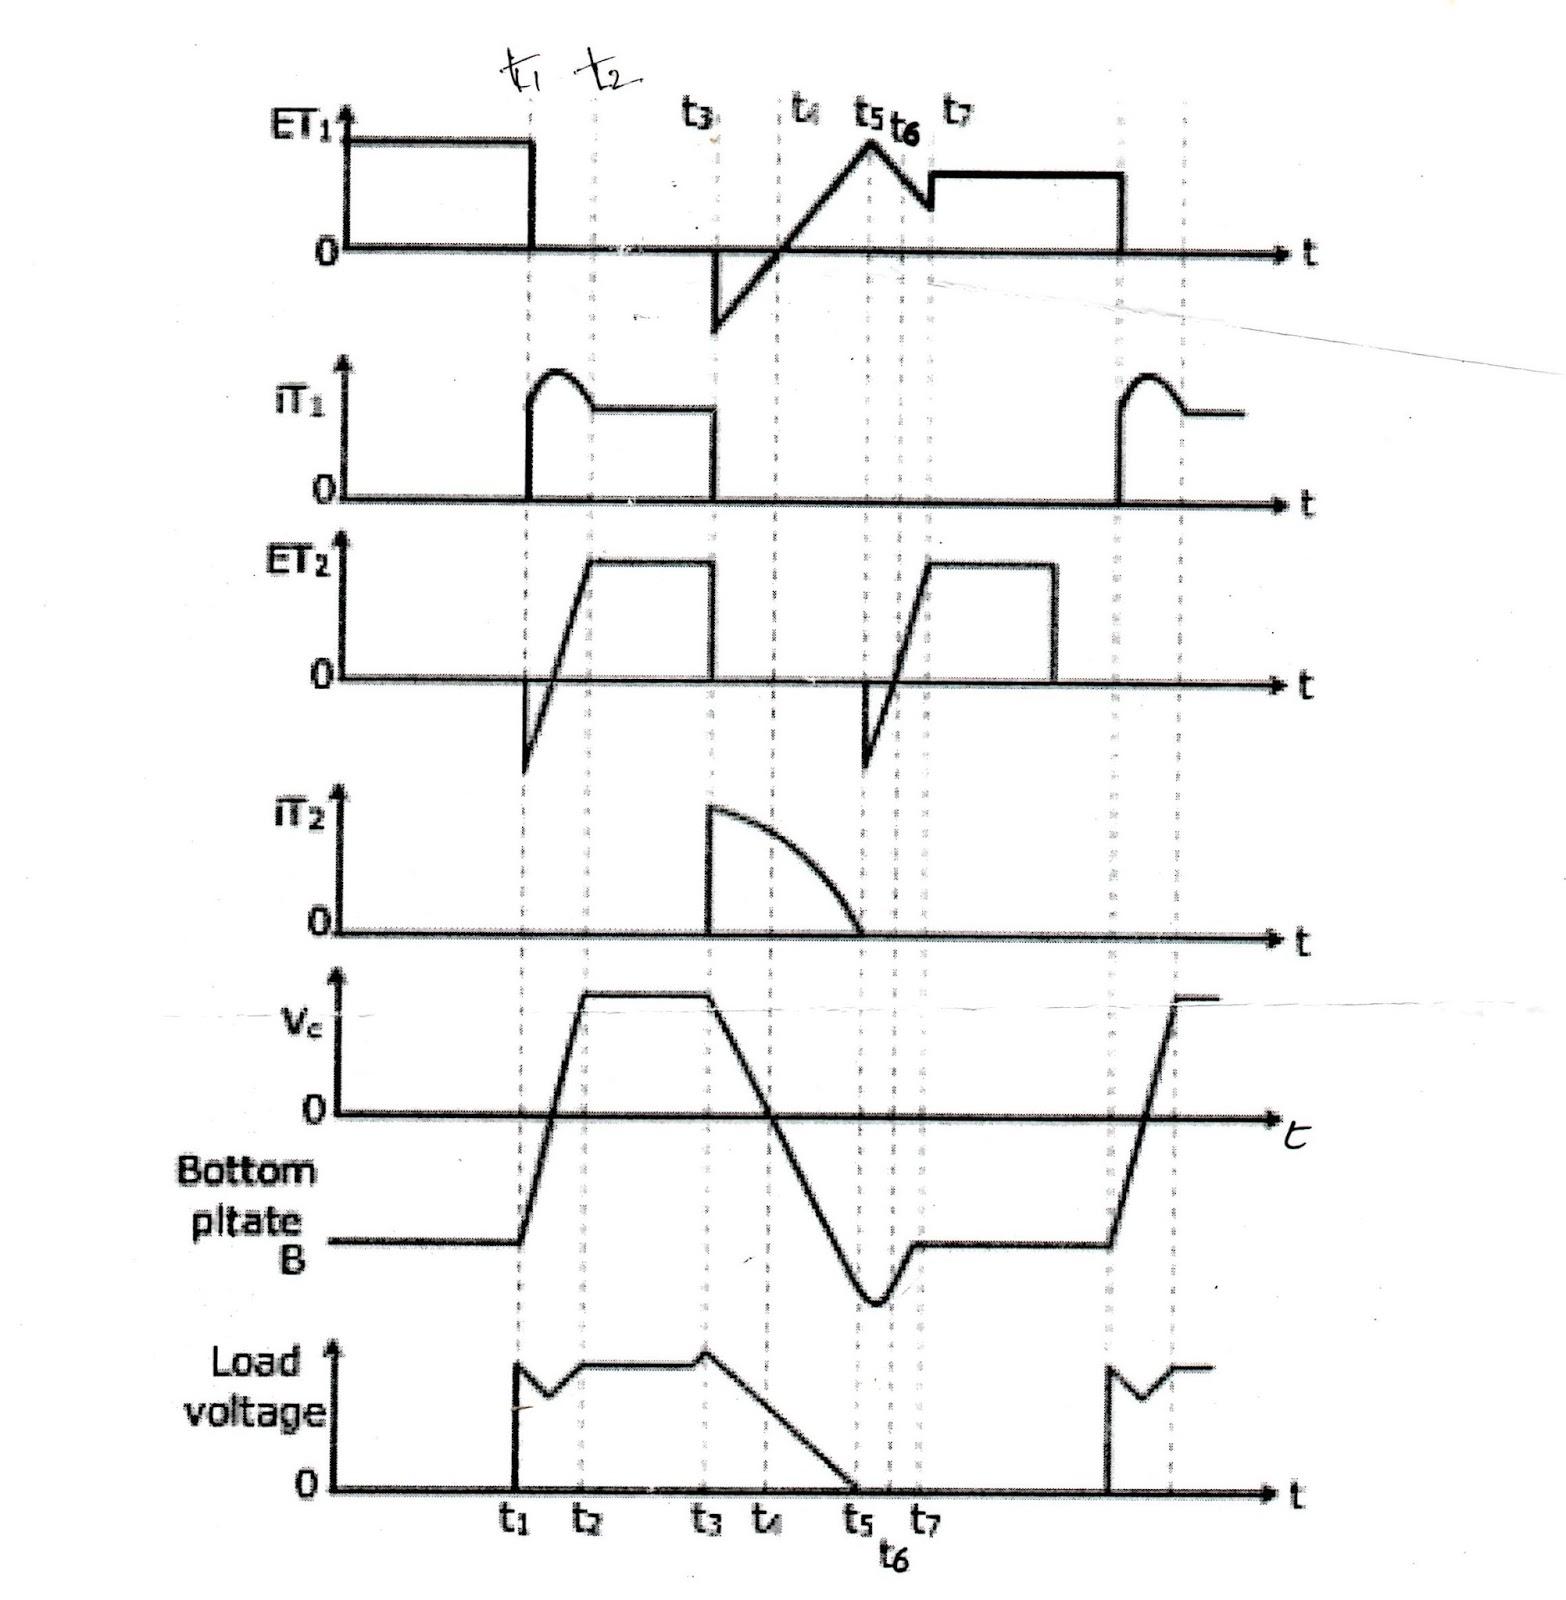 medium resolution of engineering notes jones chopper engineering notes deep fryer diagram circuit diagram jones chopper